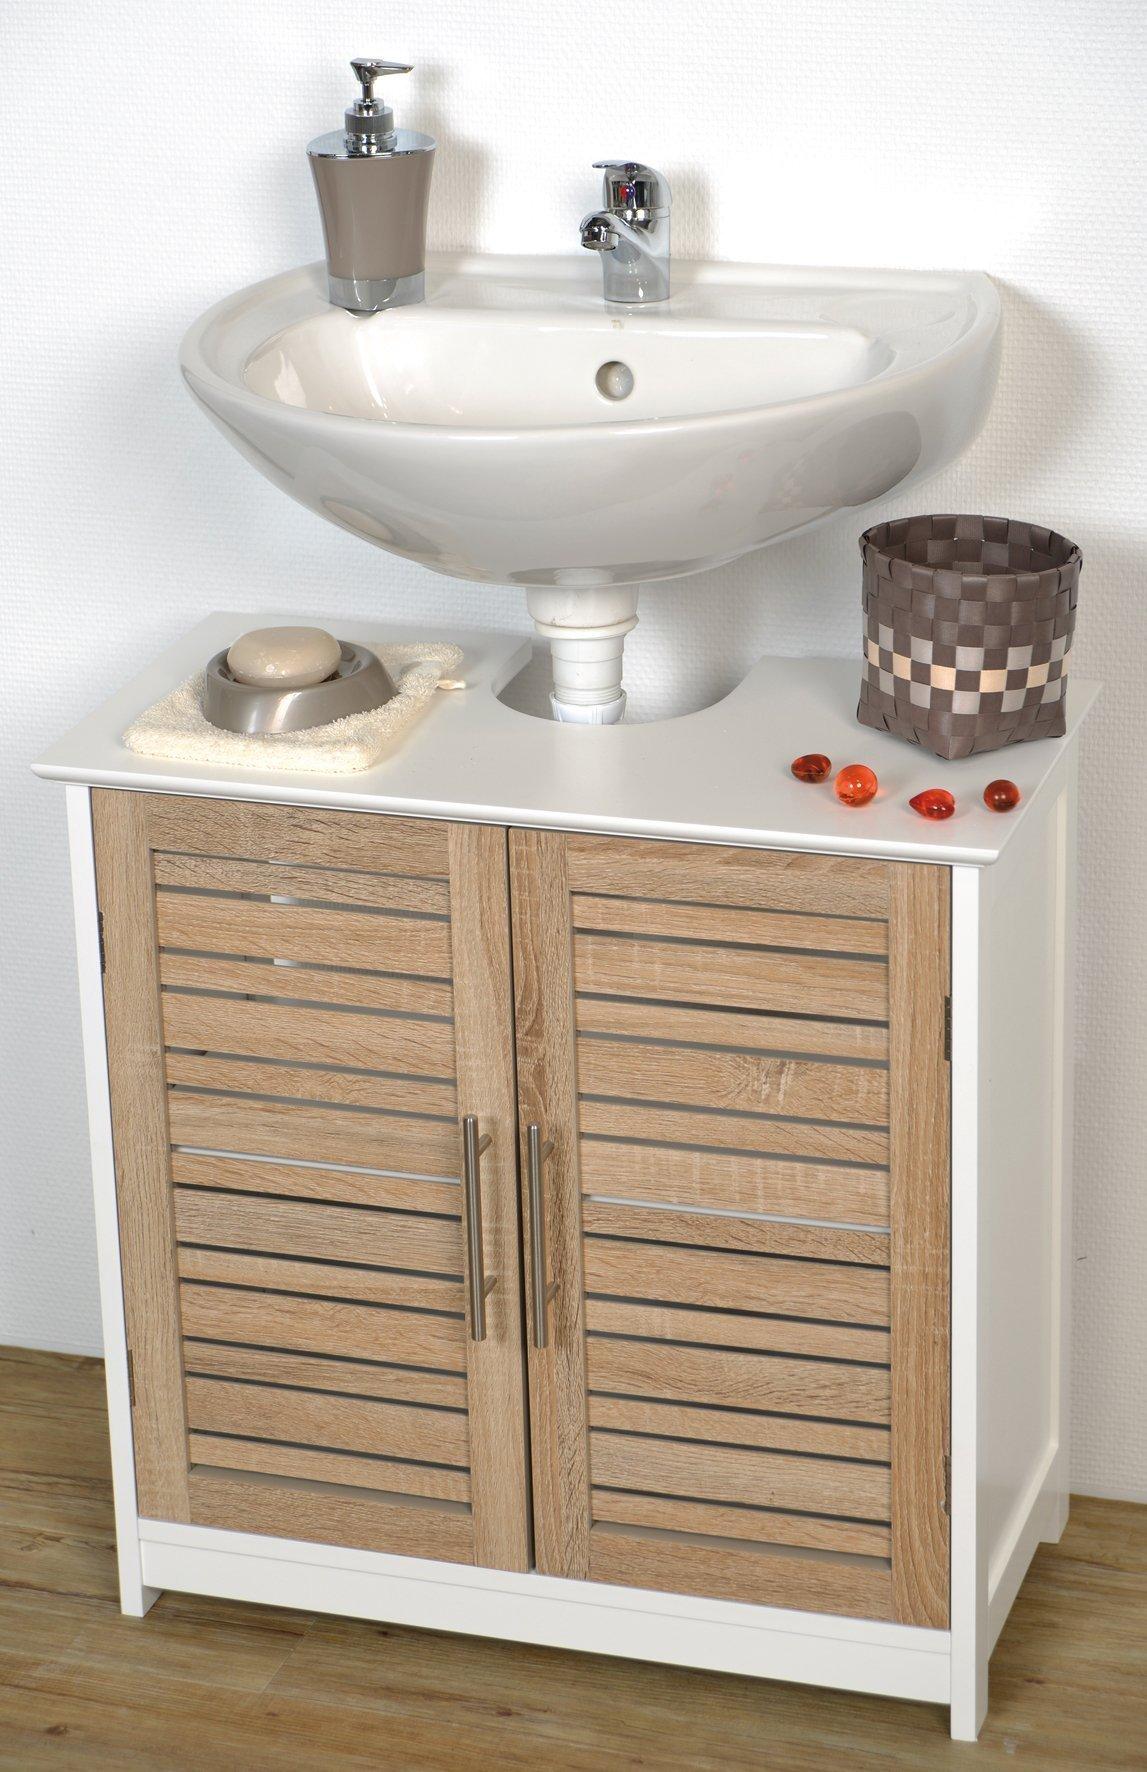 EVIDECO 9900306 Free Standing  Non Pedestal Under Sink Vanity Cabinet, Bath Storage Stockholm by EVIDECO